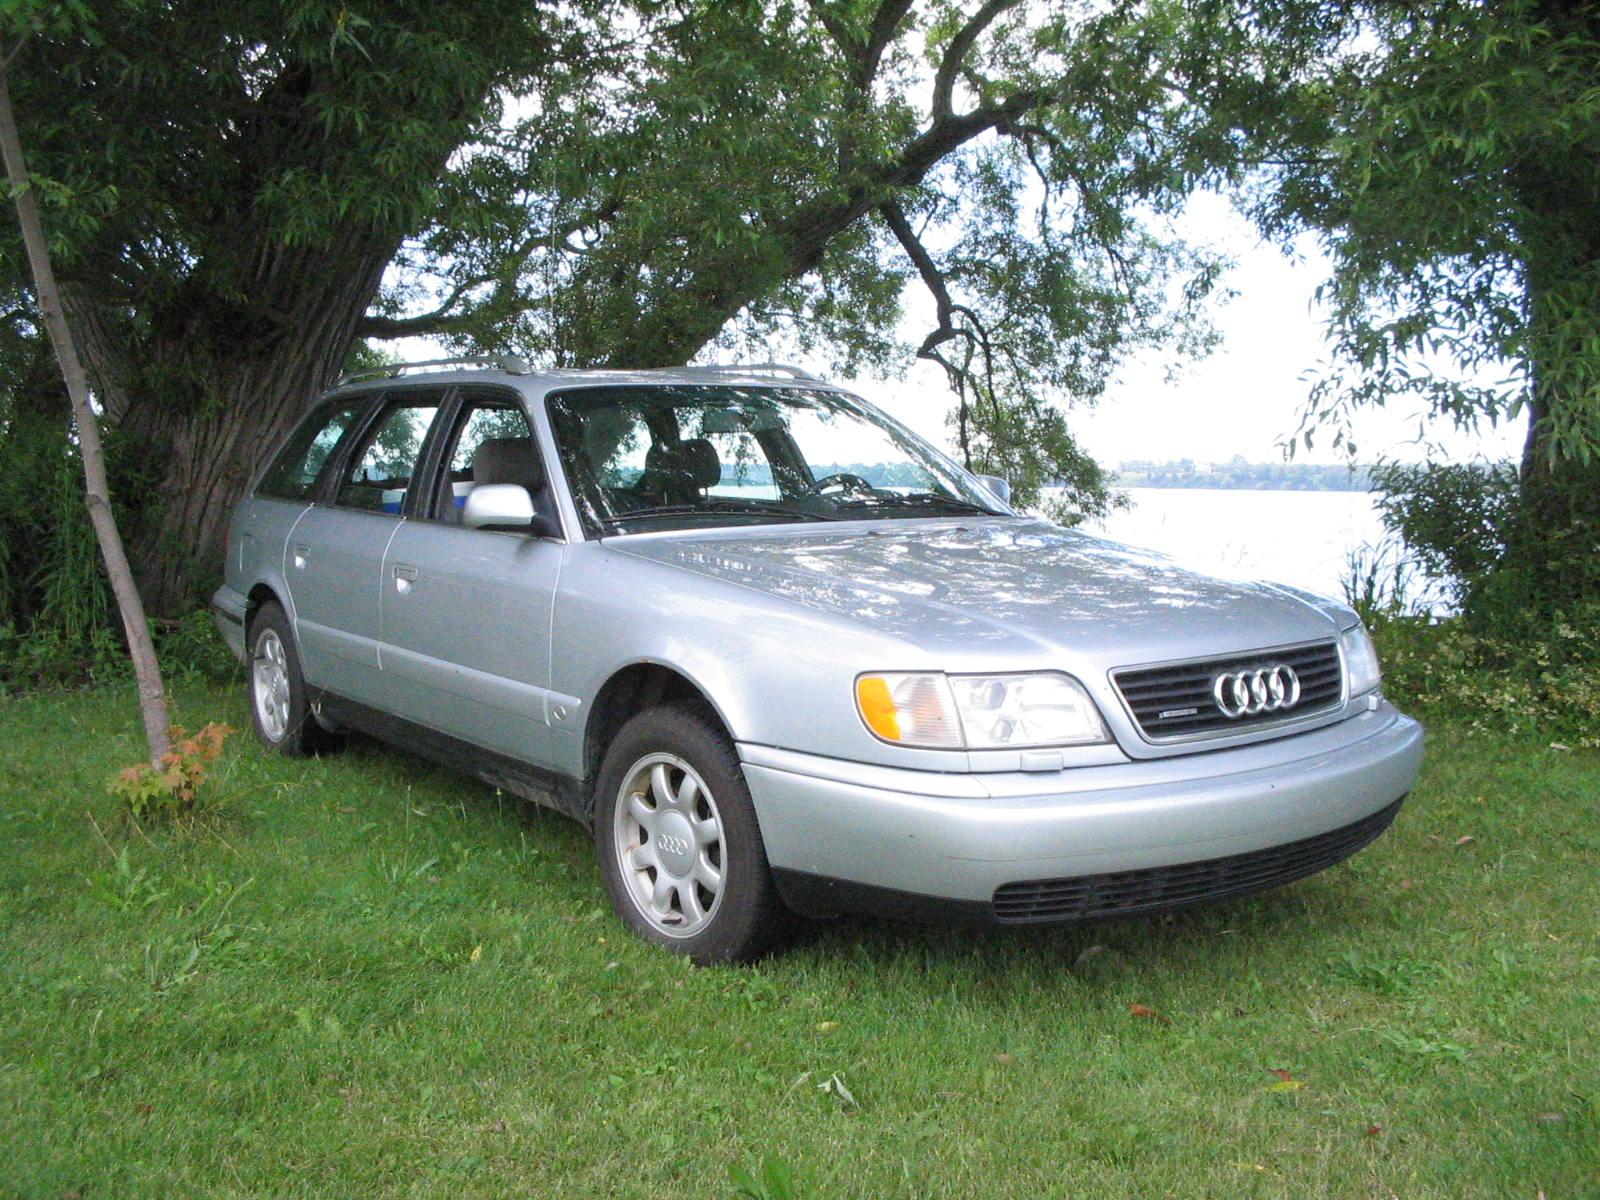 1997 Audi A6 Image 12